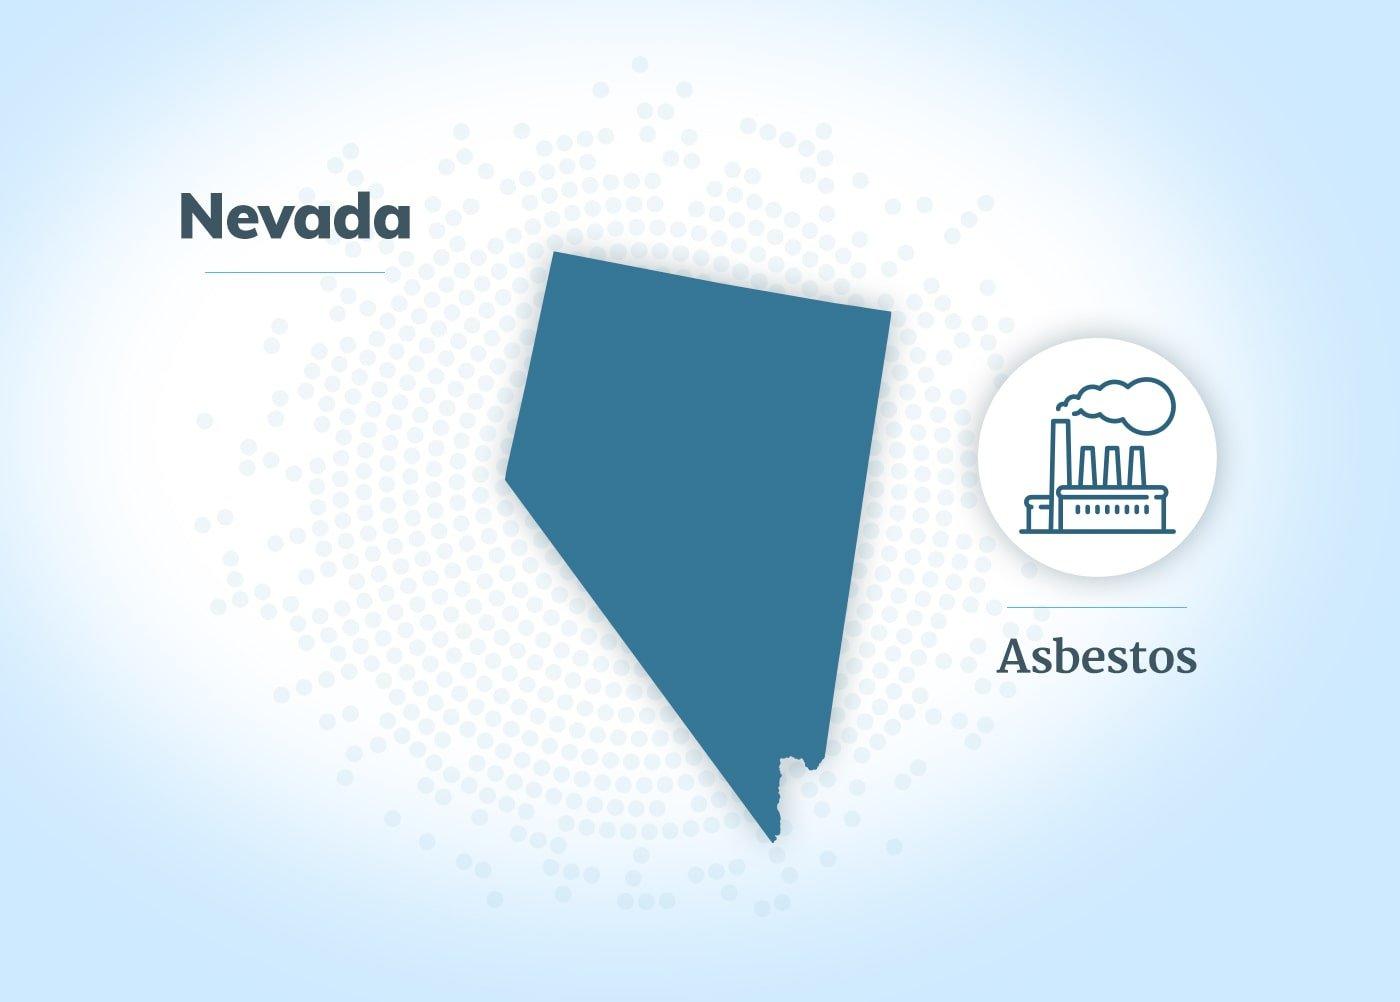 Asbestos exposure in Nevada